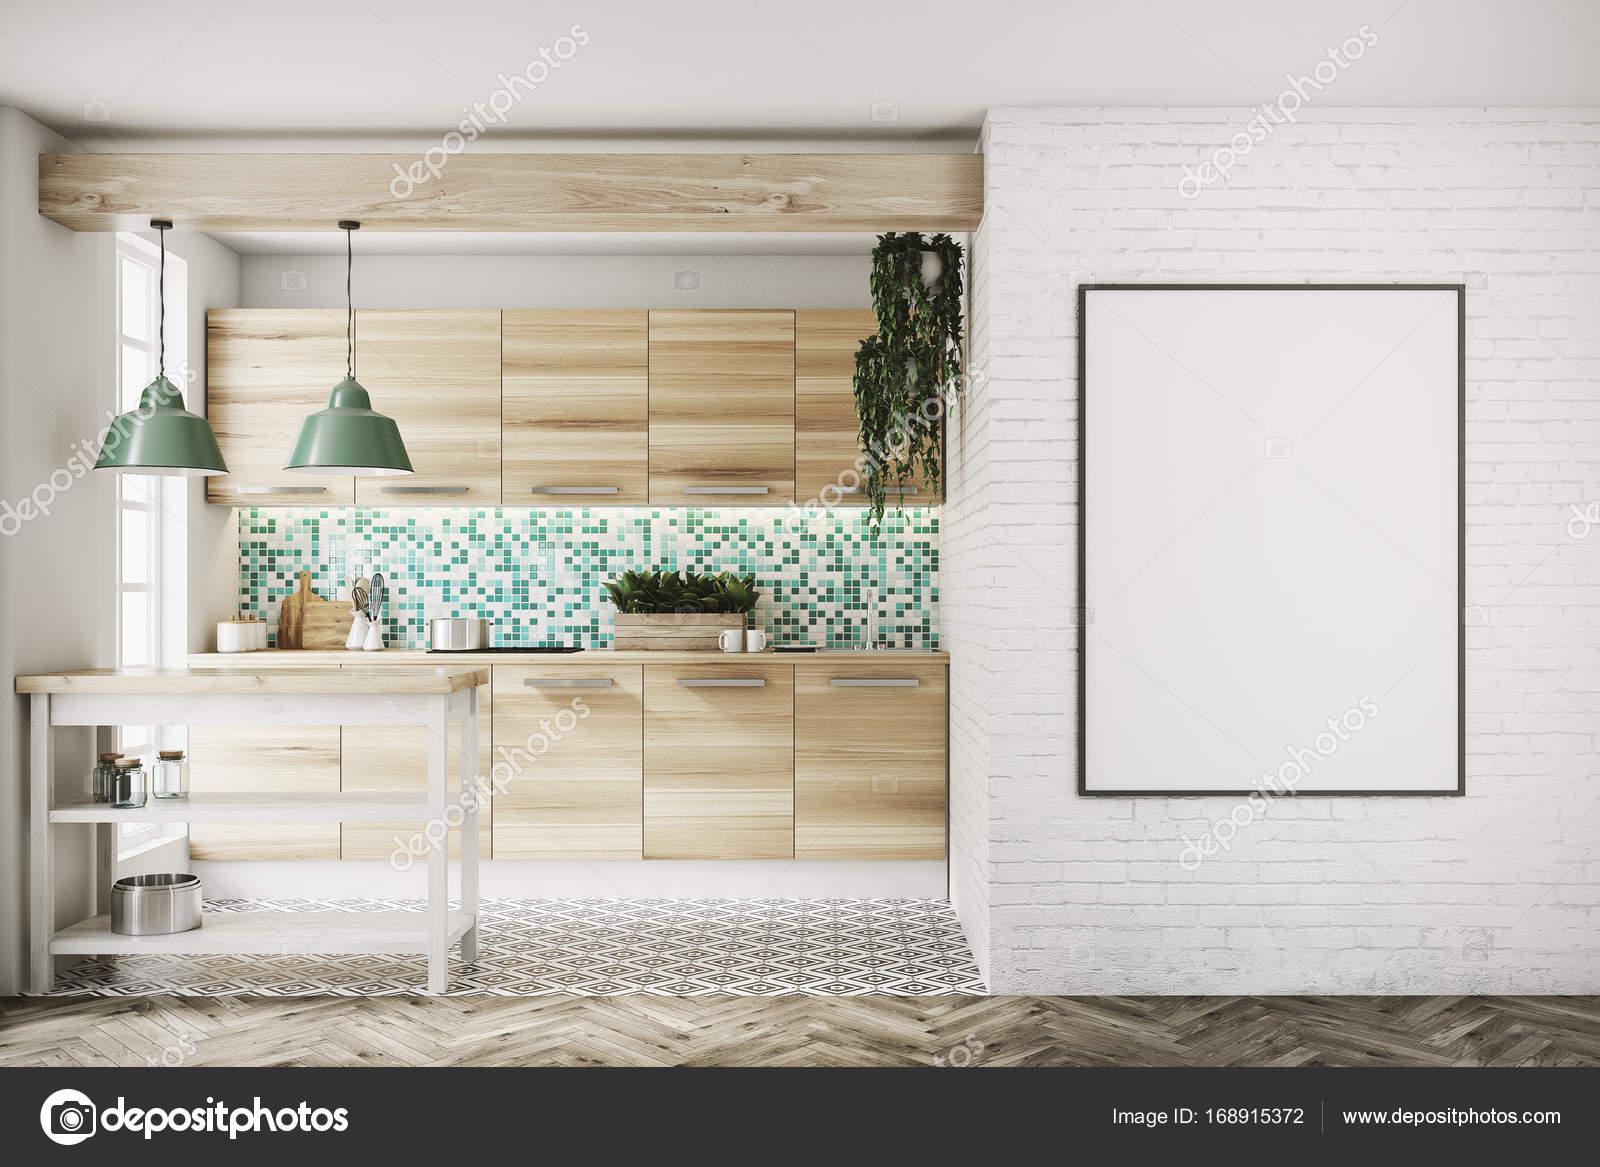 kitchen console sets 绿色马赛克厨房 木控制台 海报 图库照片 c denisismagilov 168915372 高档厨房内部与绿色和白色拼接墙 大窗户 有趣的地板图案和木制控制台和表 装裱的海报 3d 渲染小样 照片作者denisismagilov